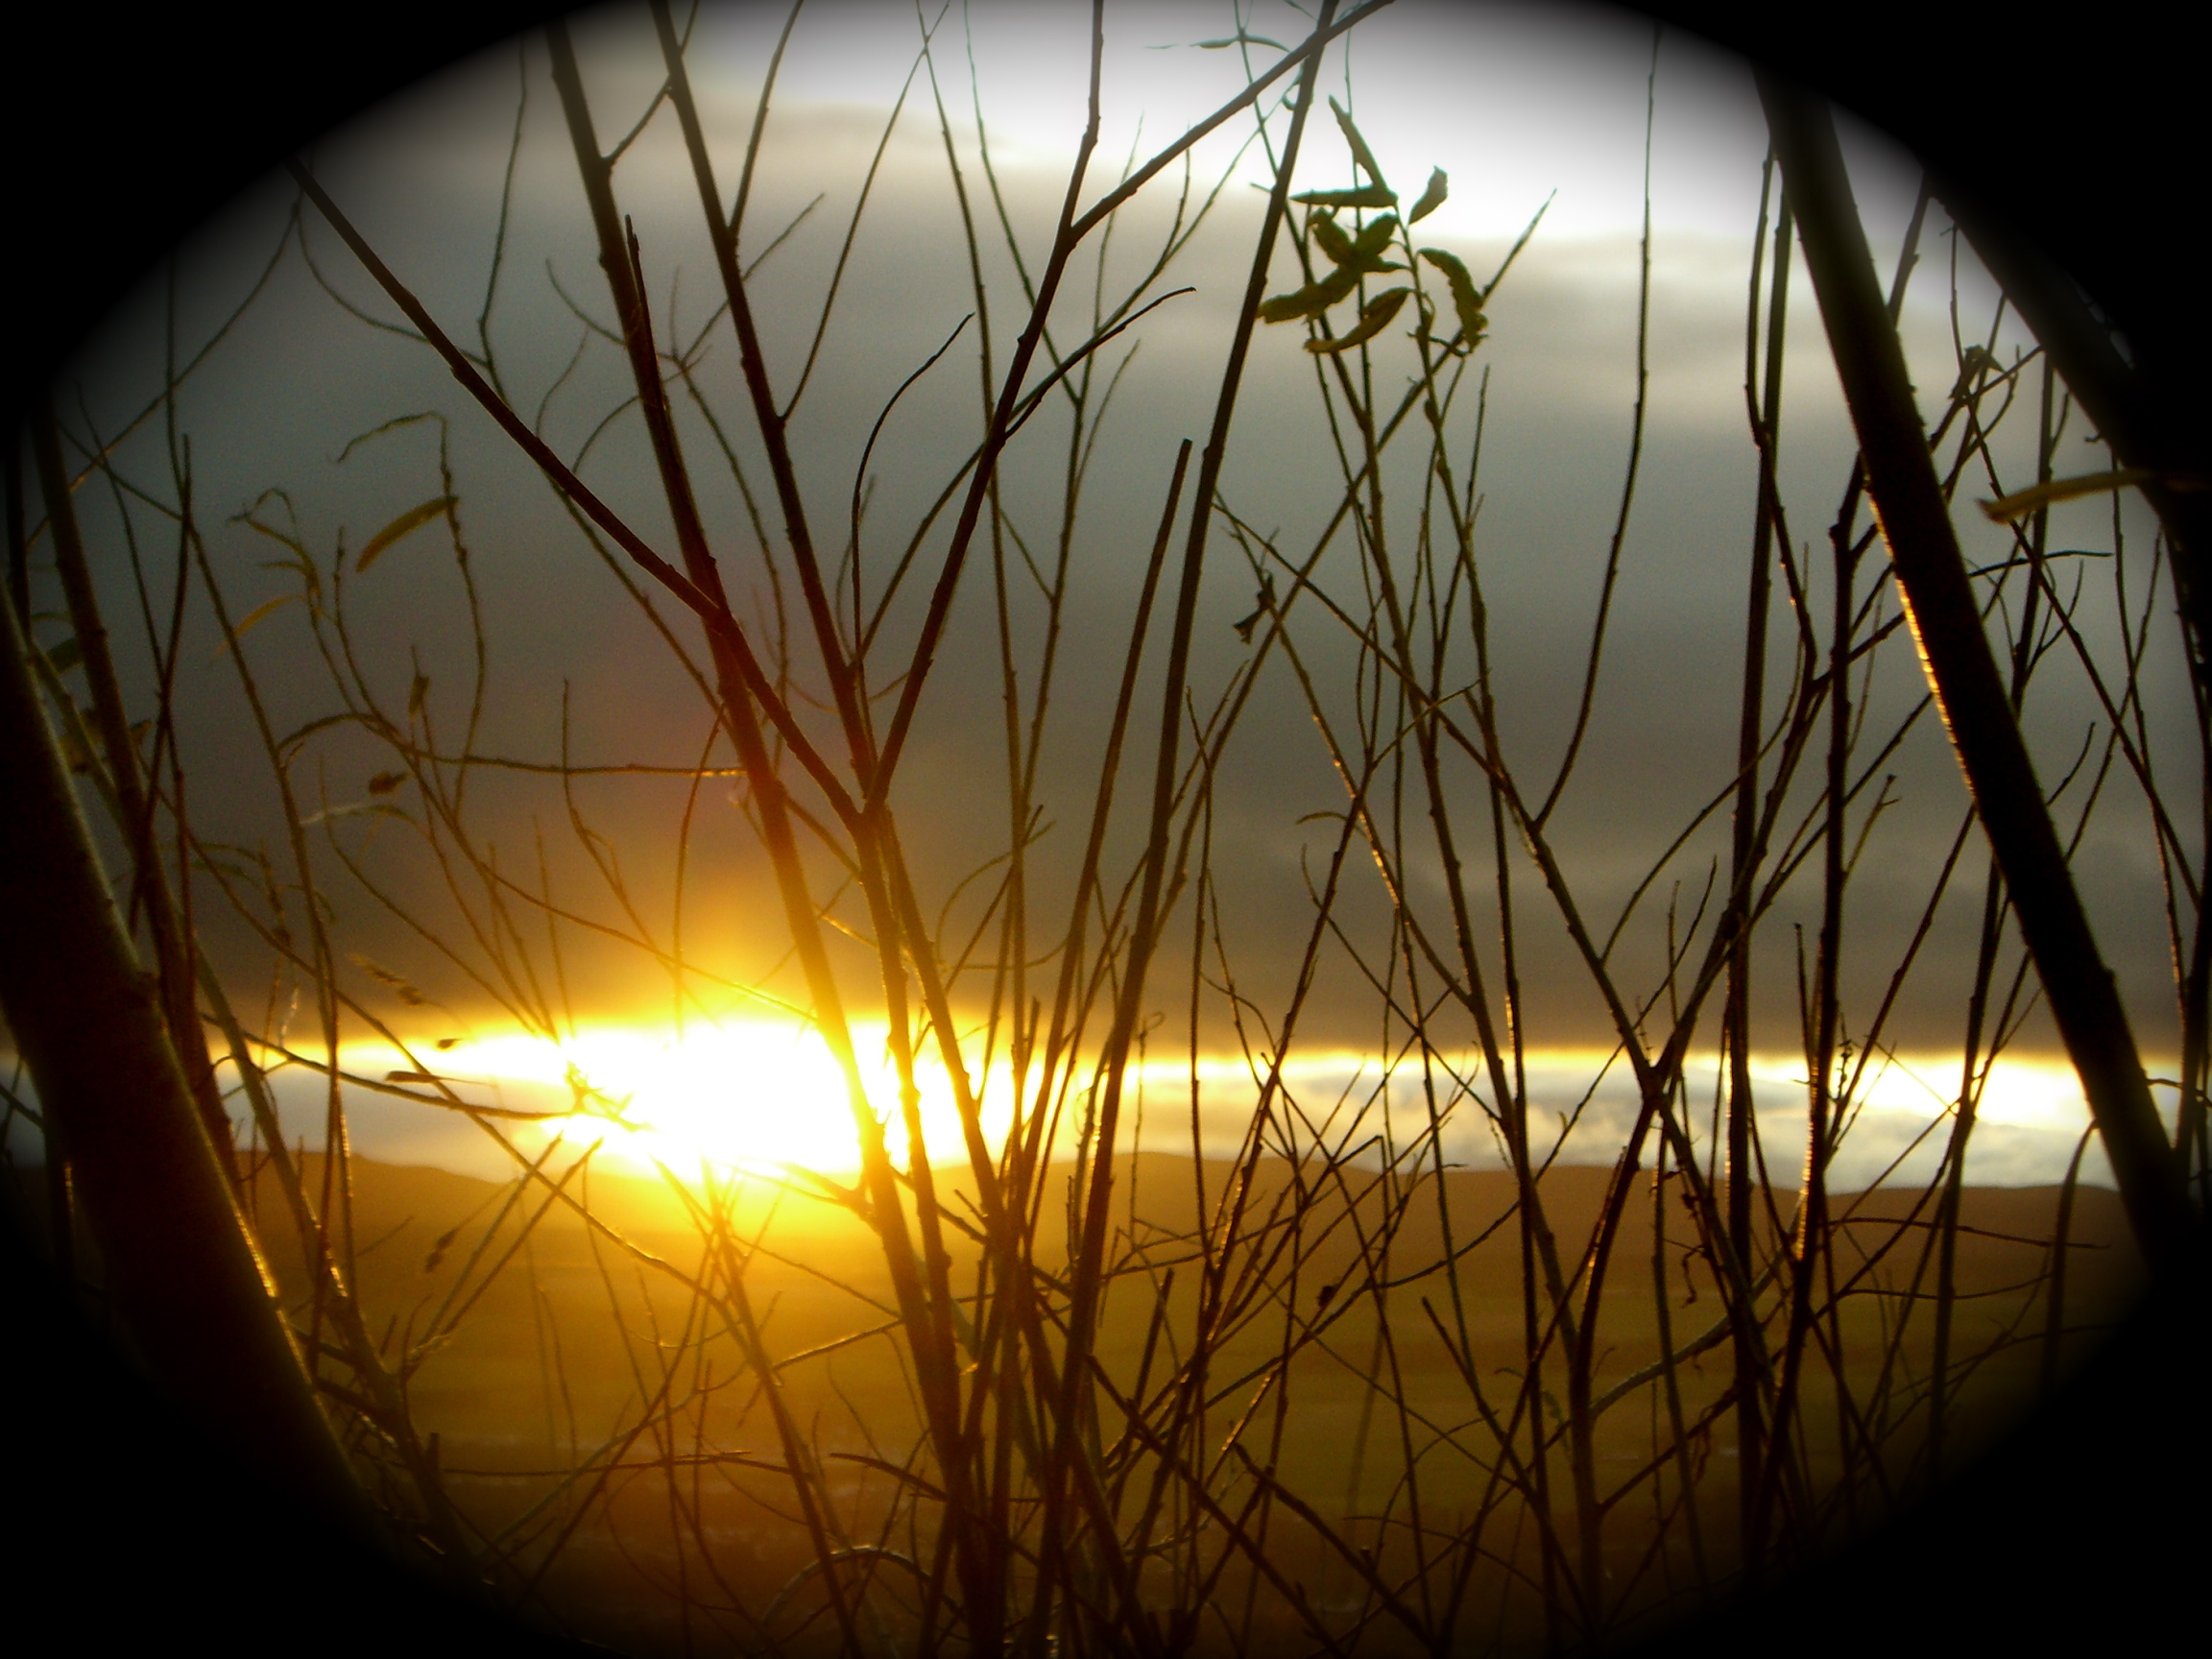 sunrise in Inverness